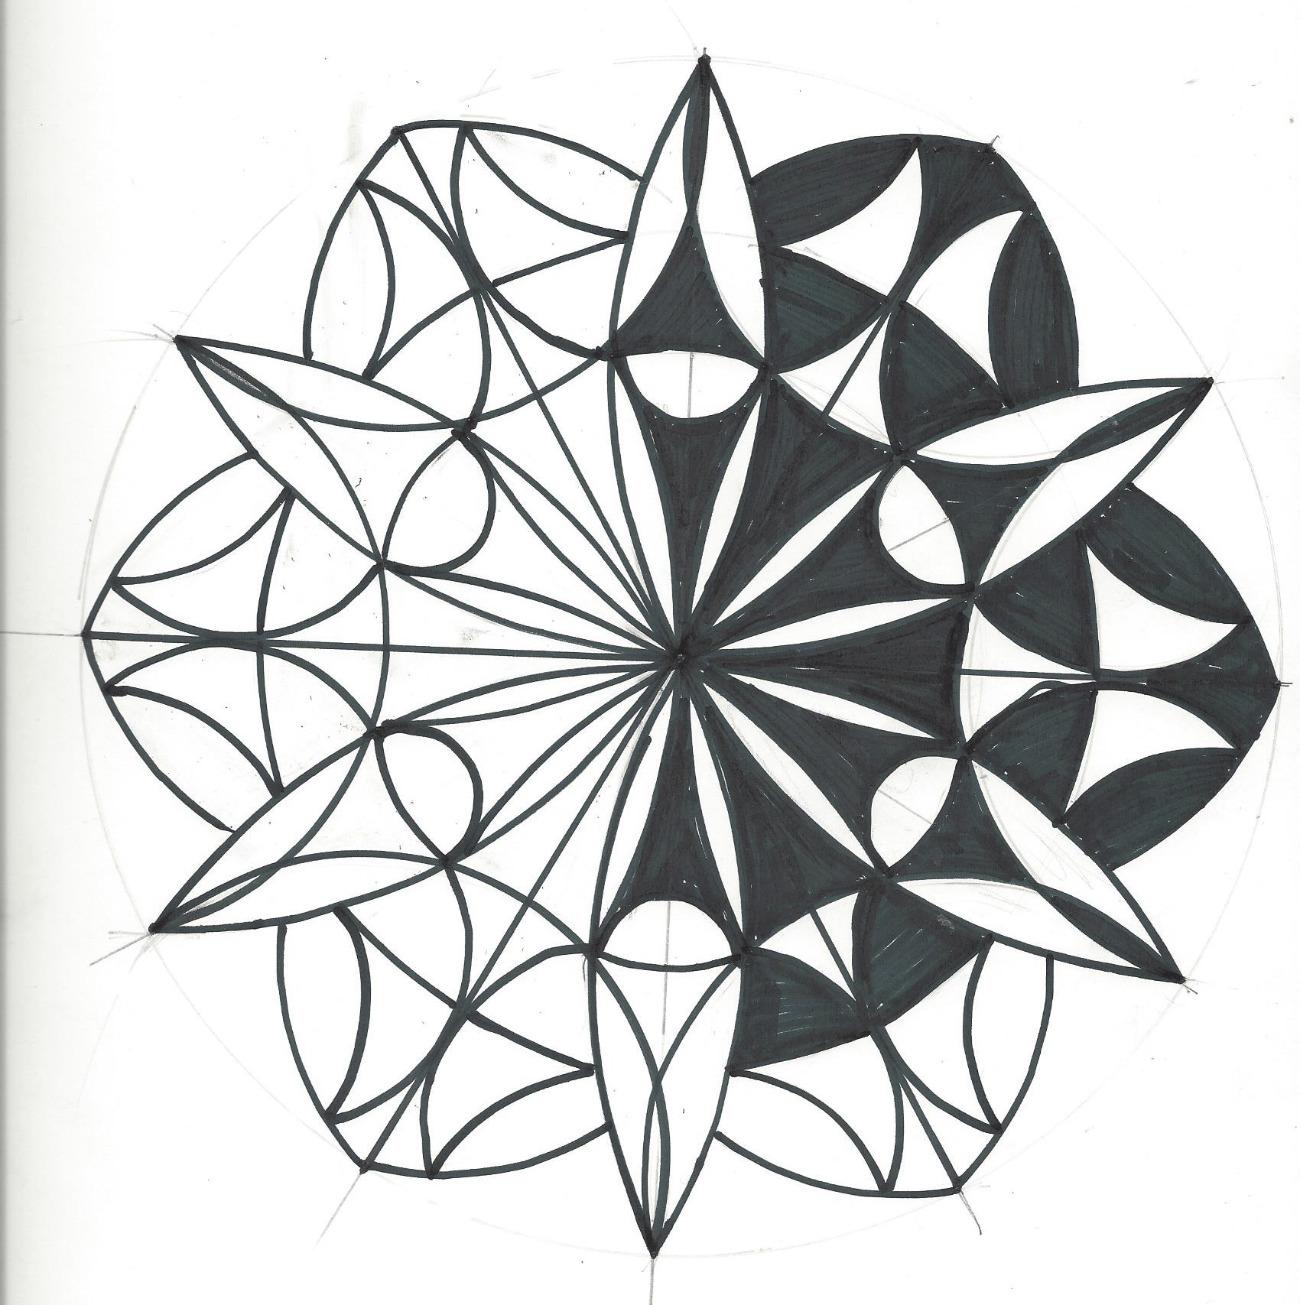 Mandala von Mäggi Braun (Kurs Angelika Hentschel)